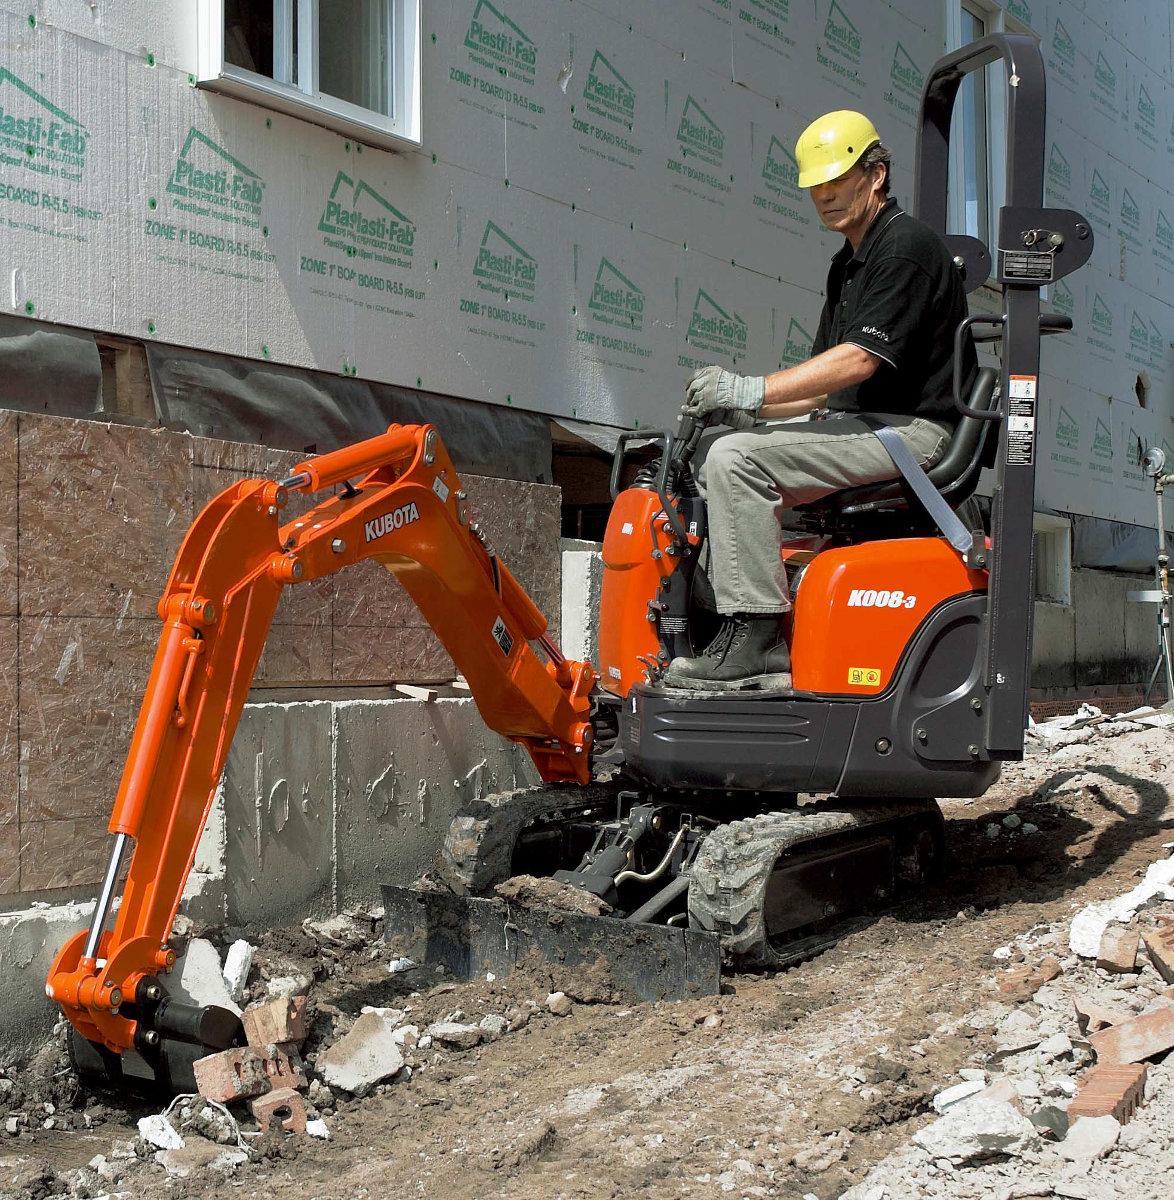 Mini Excavator Mini Digger 0 8 Tonne Wellers Hire